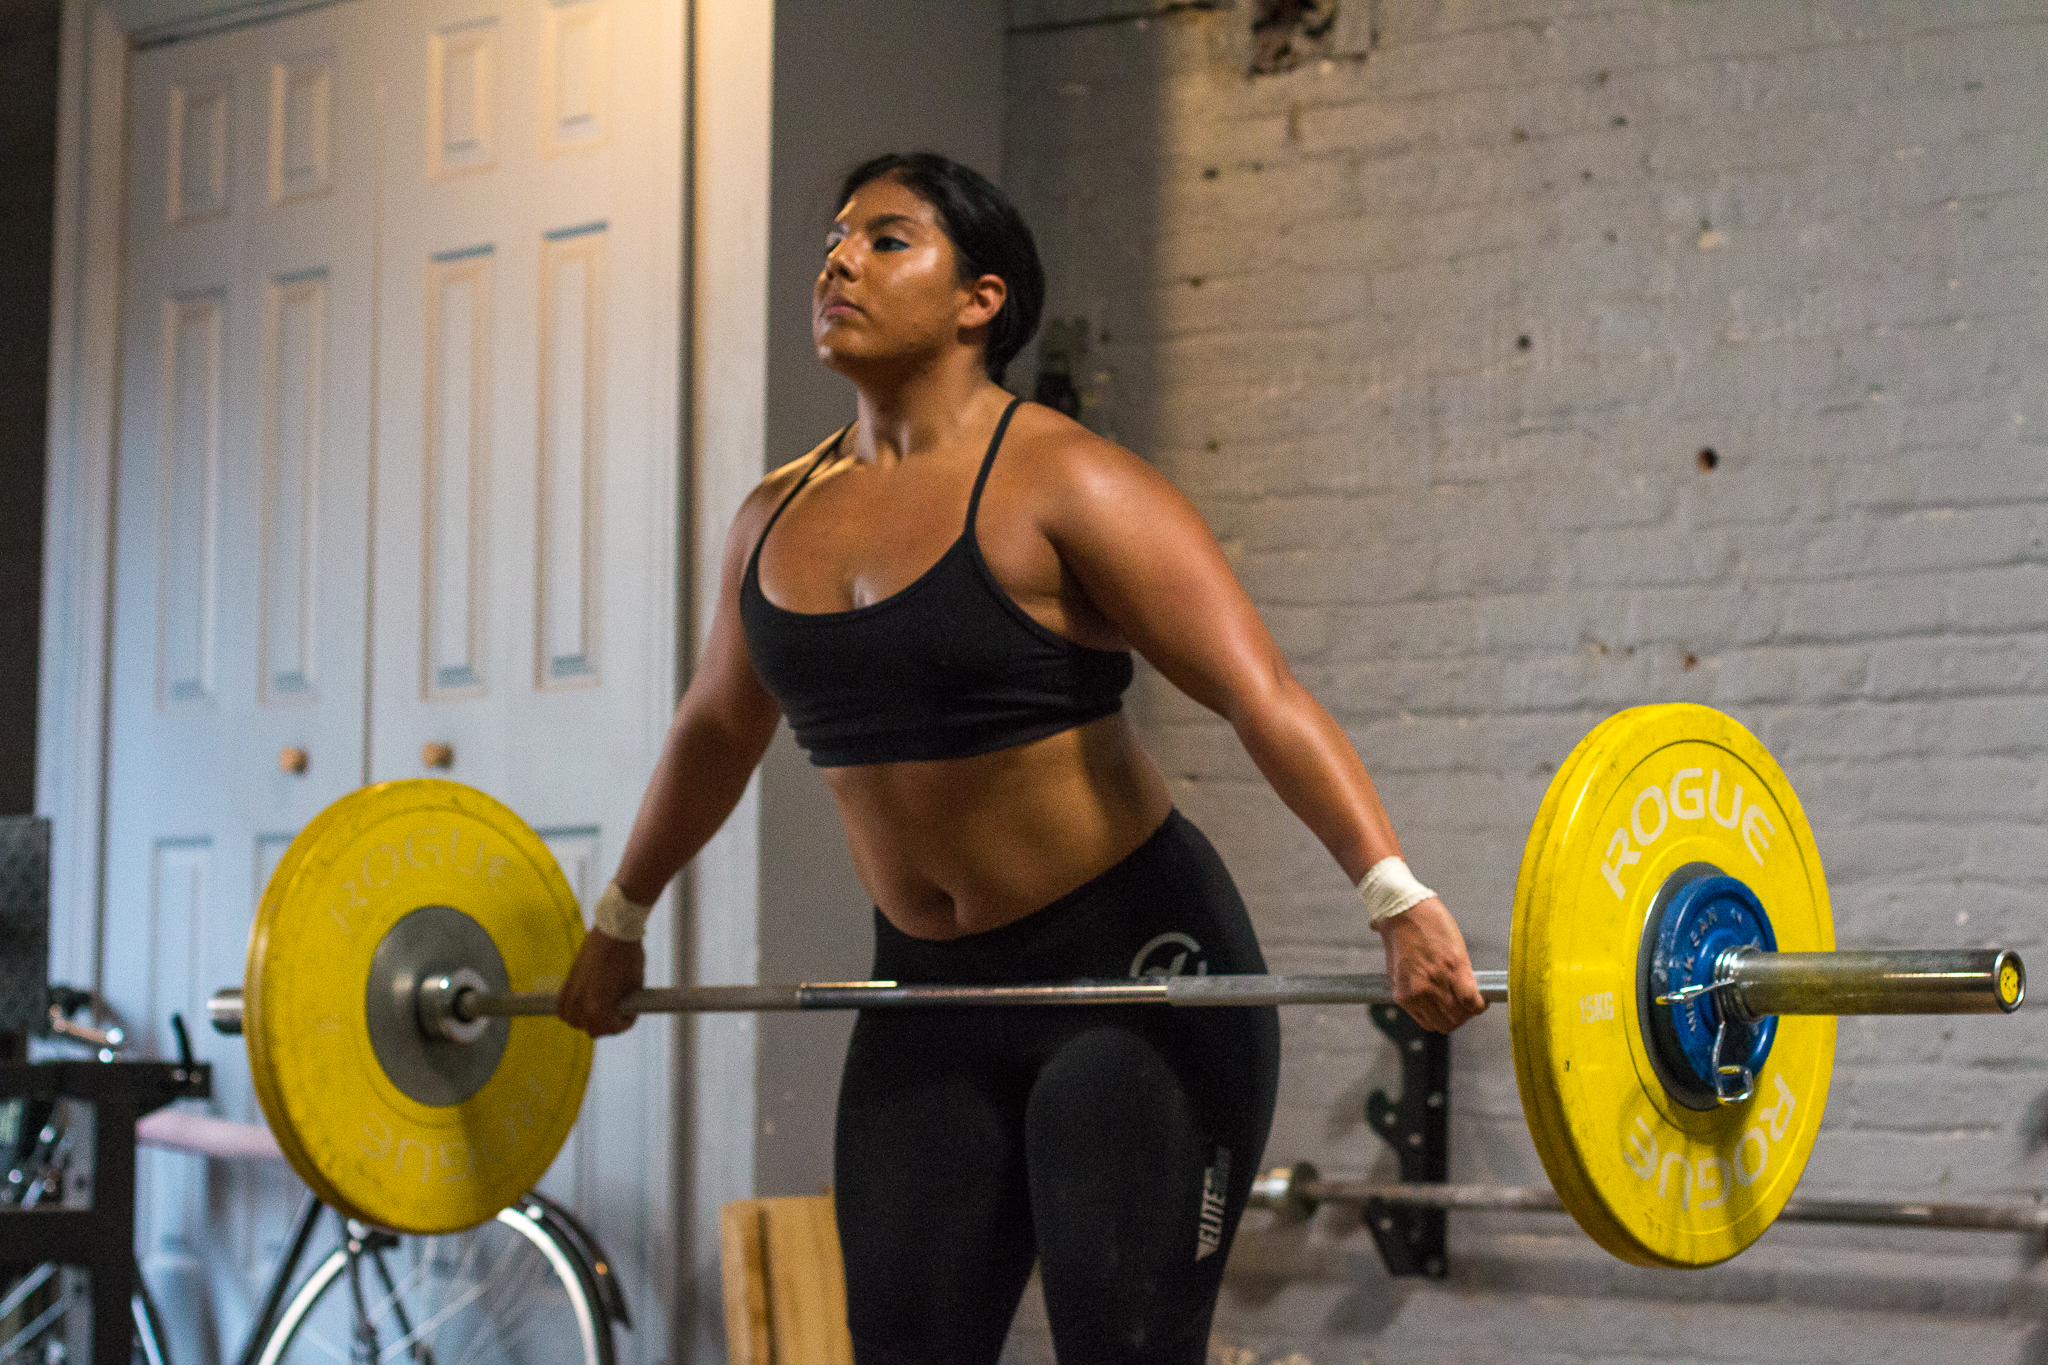 james-wright-visit-brooklyn-new-york-weightlifting-coach-teammates-october-2016 (13 of 92).jpg